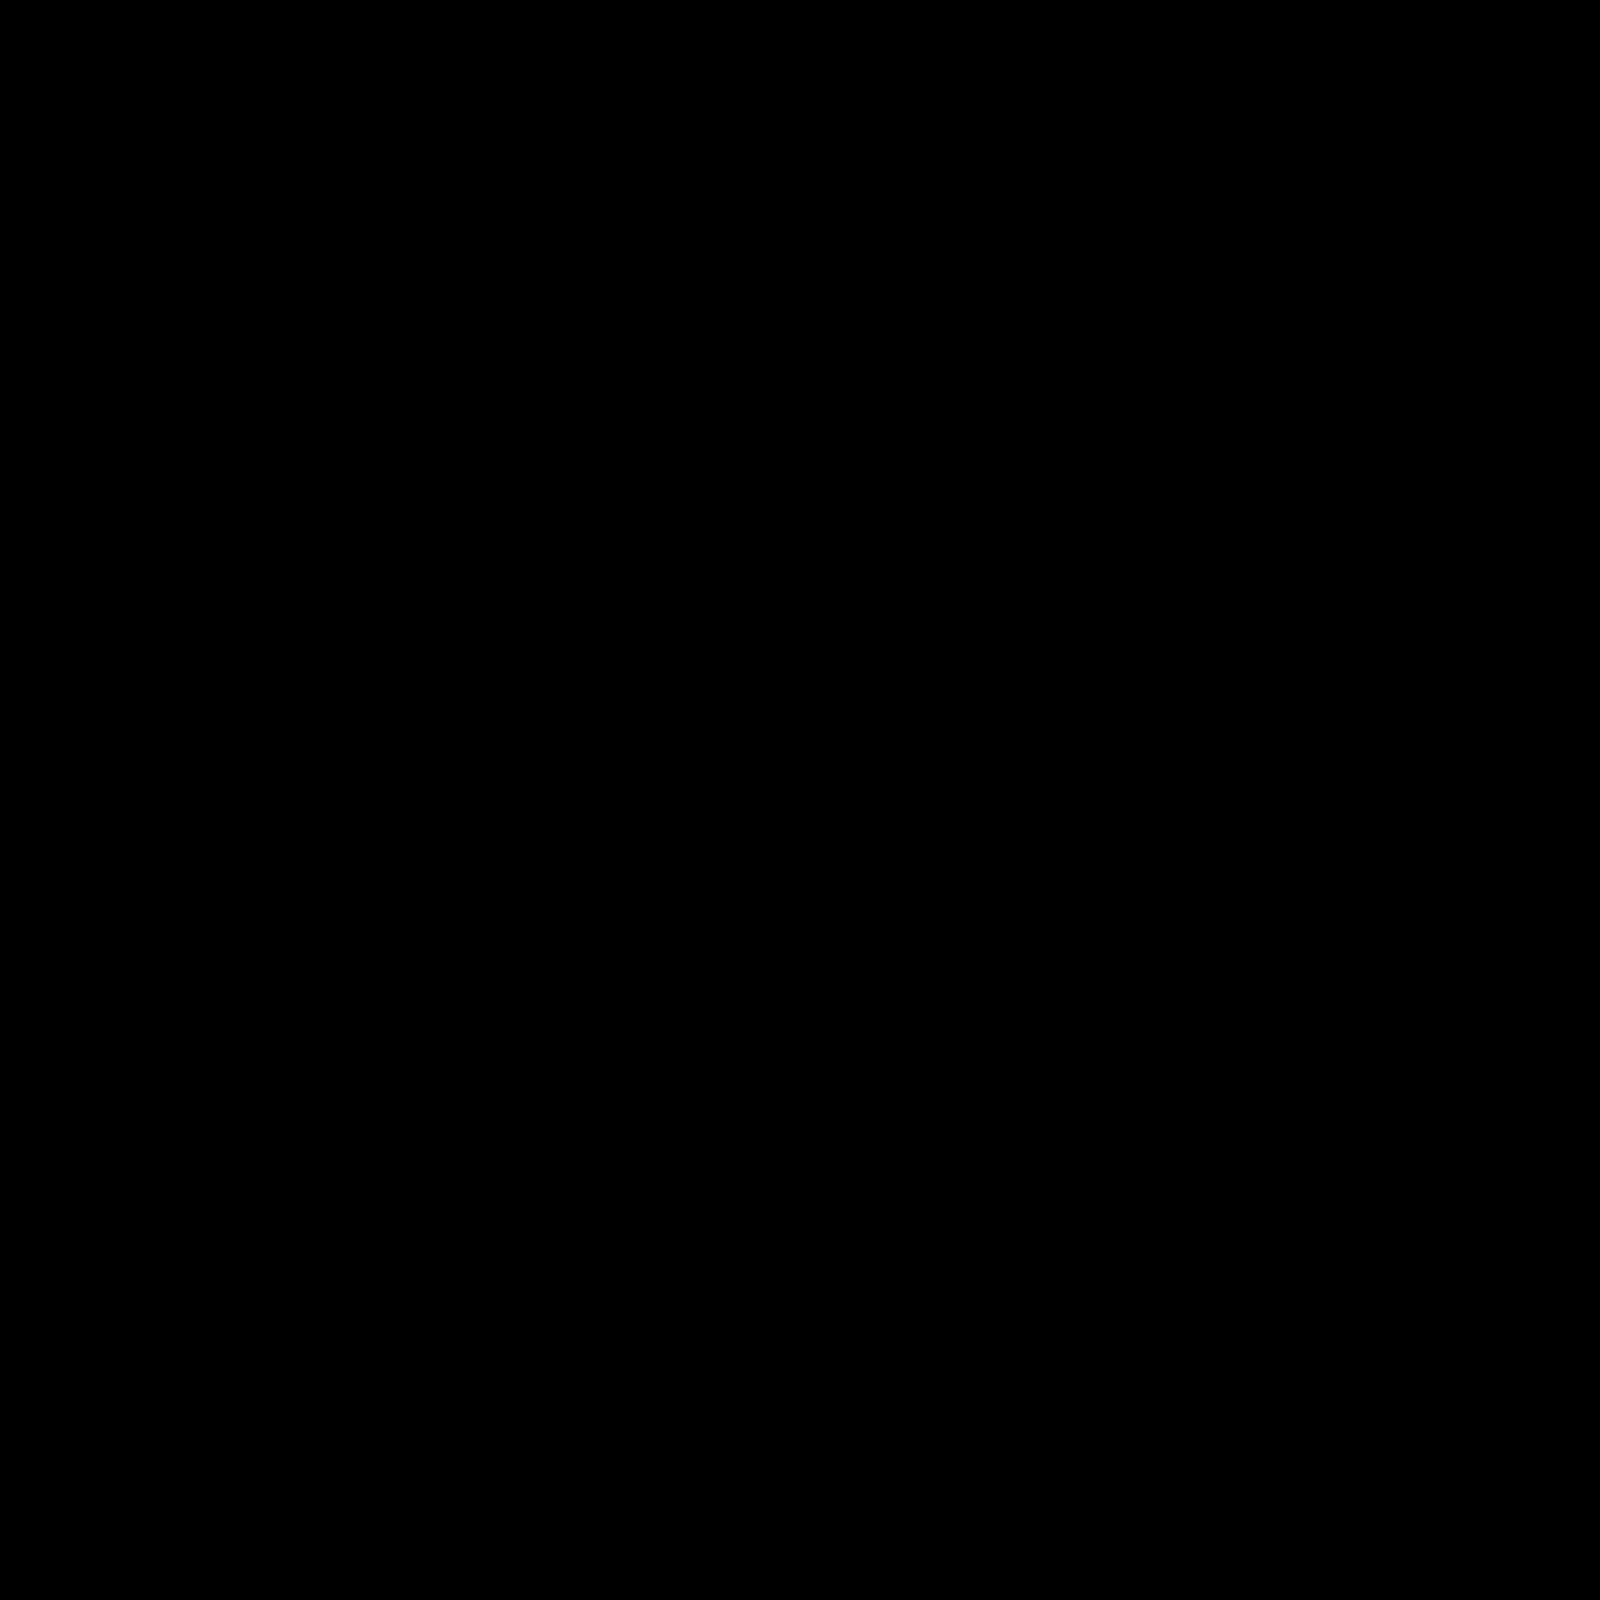 Computer icons medicine therapy. Nurse clipart icon